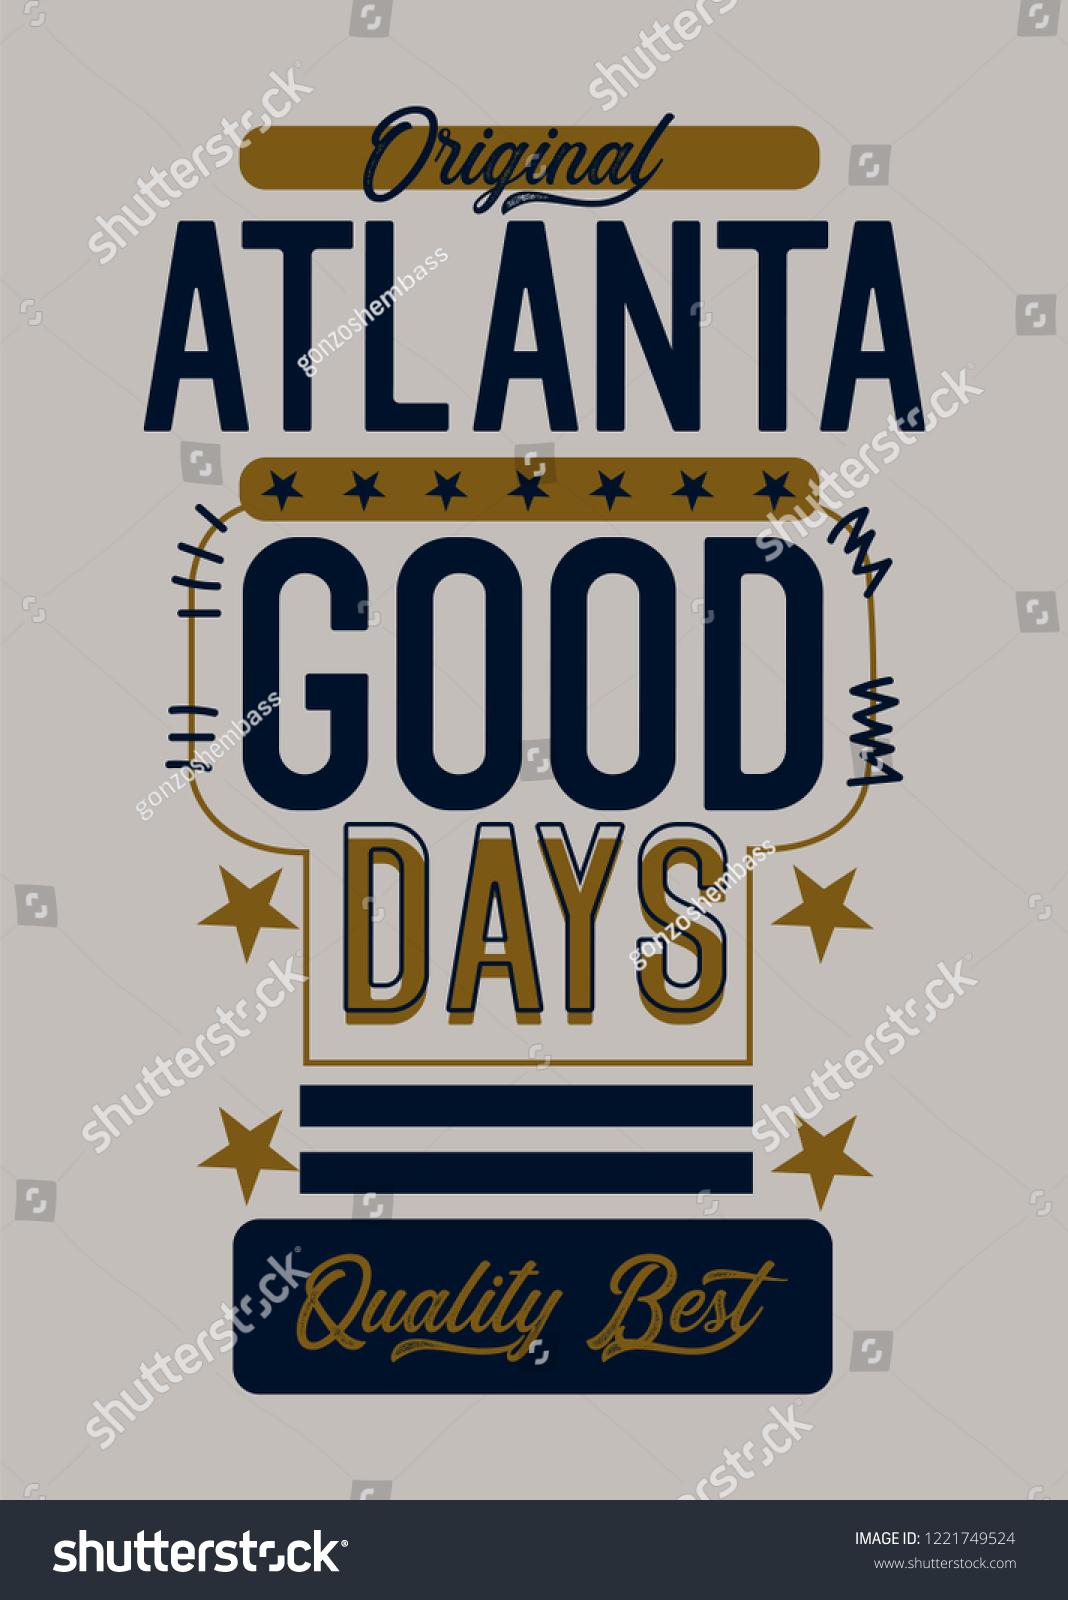 Atlanta Good Daystshirt Design Stock Vector Royalty Free